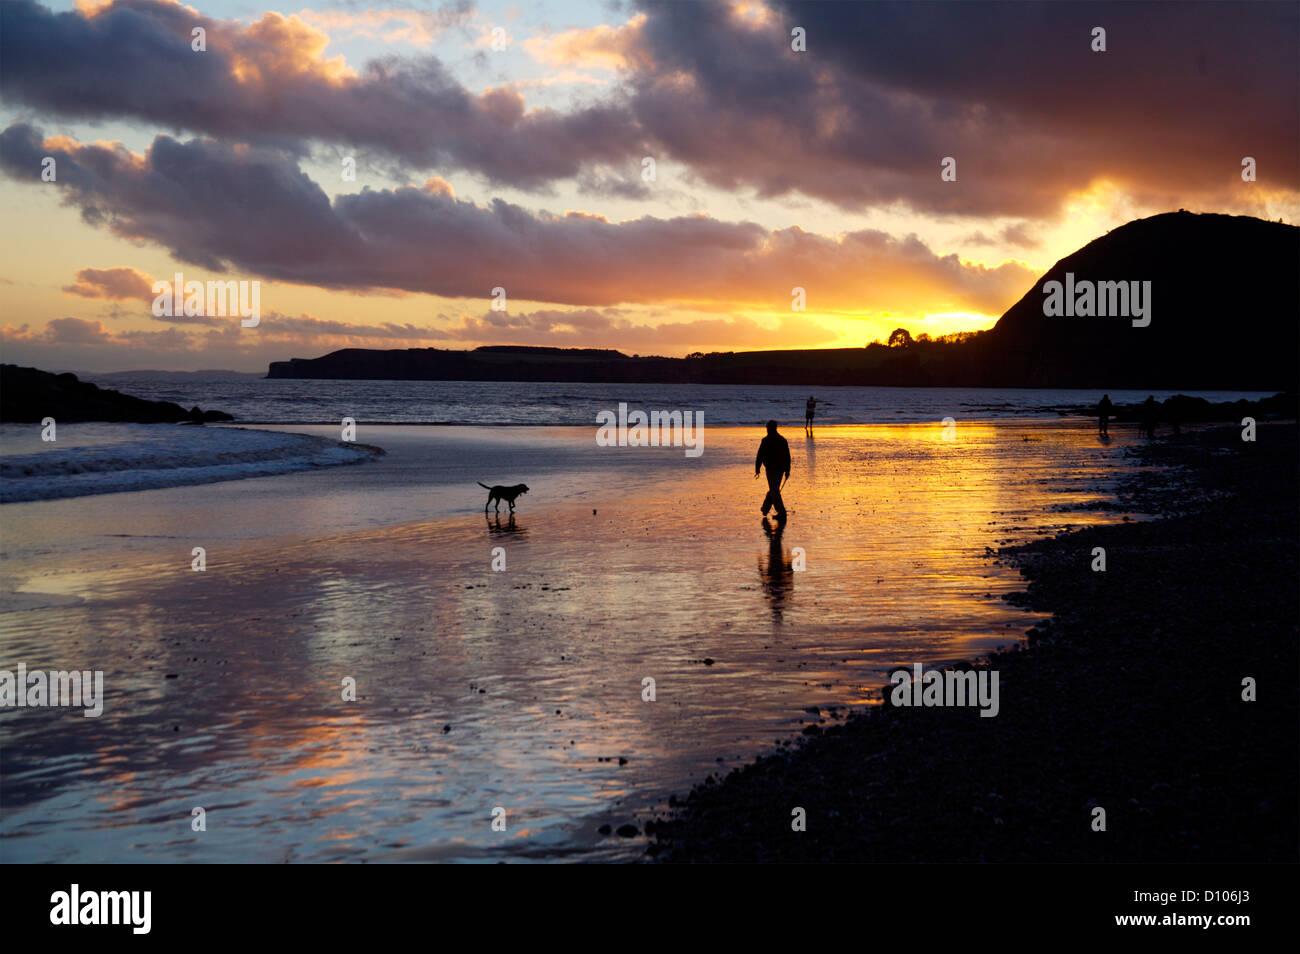 Sidmouth, Devon, England sunset reflection - Stock Image